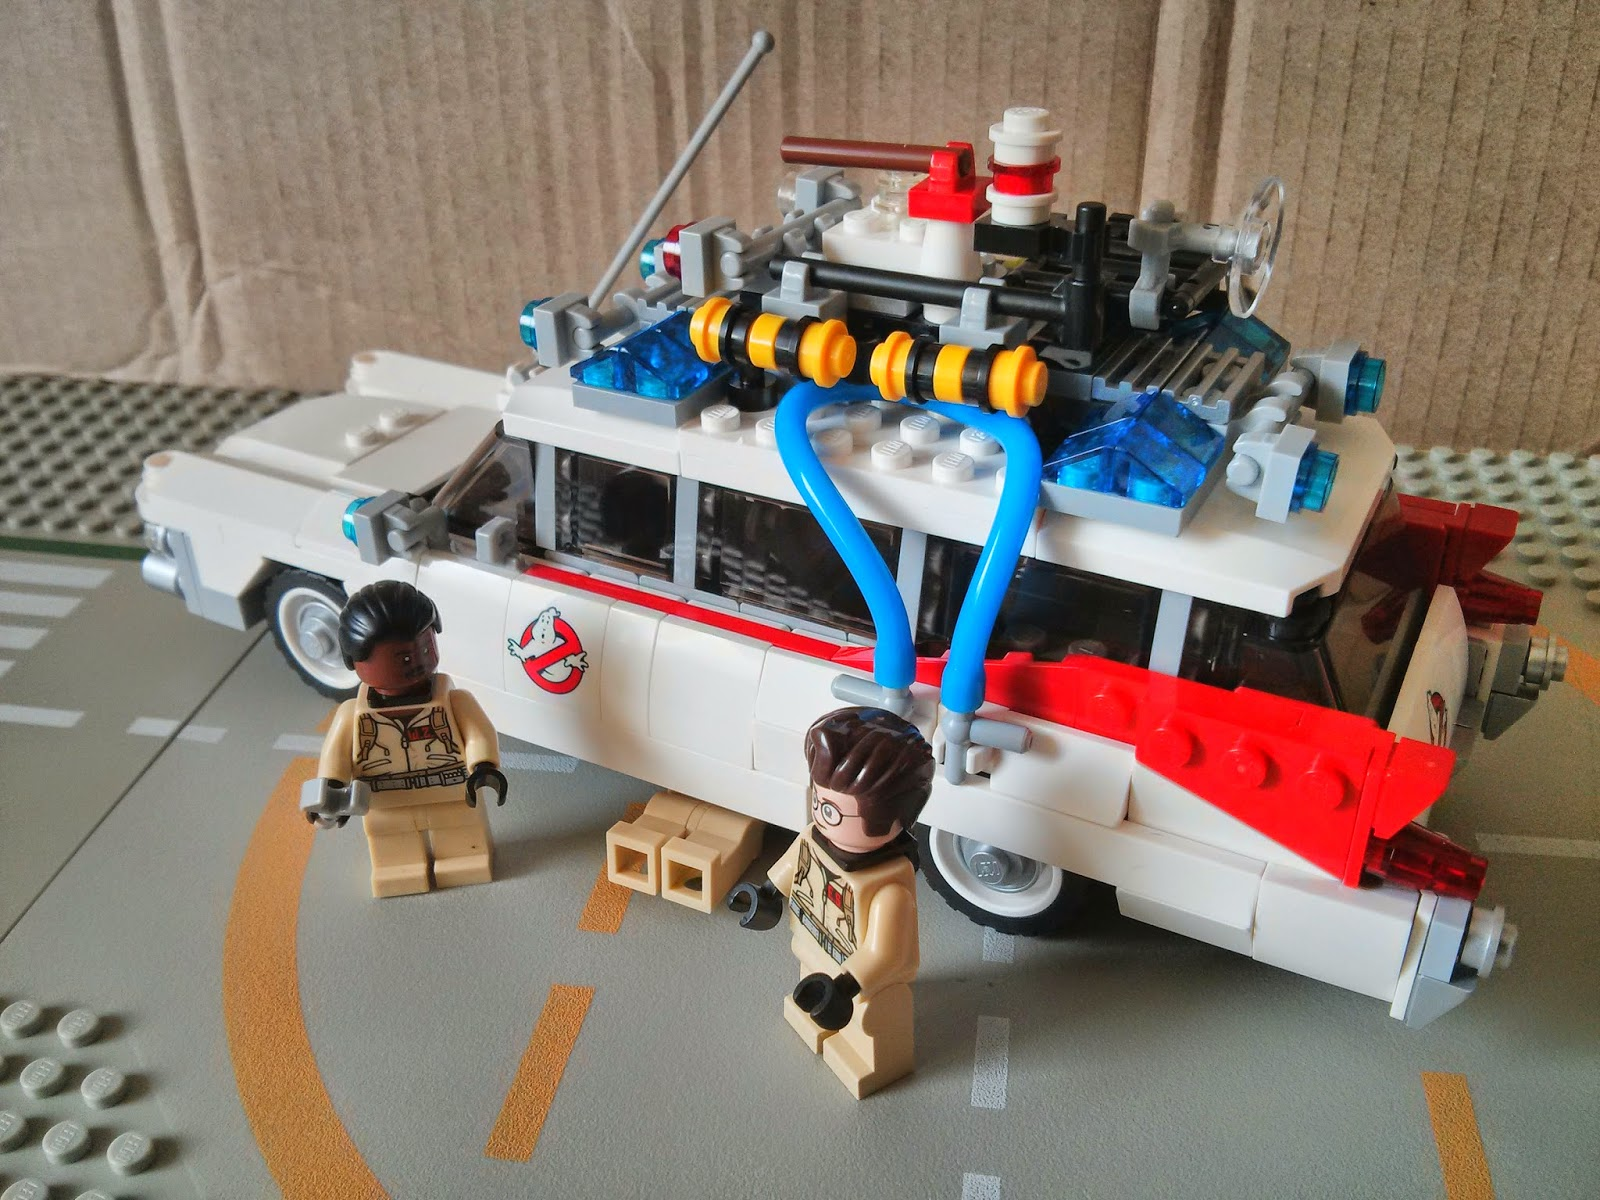 74 Gambar Modifikasi Mobil Balap Lego Terkeren Mobil Kita